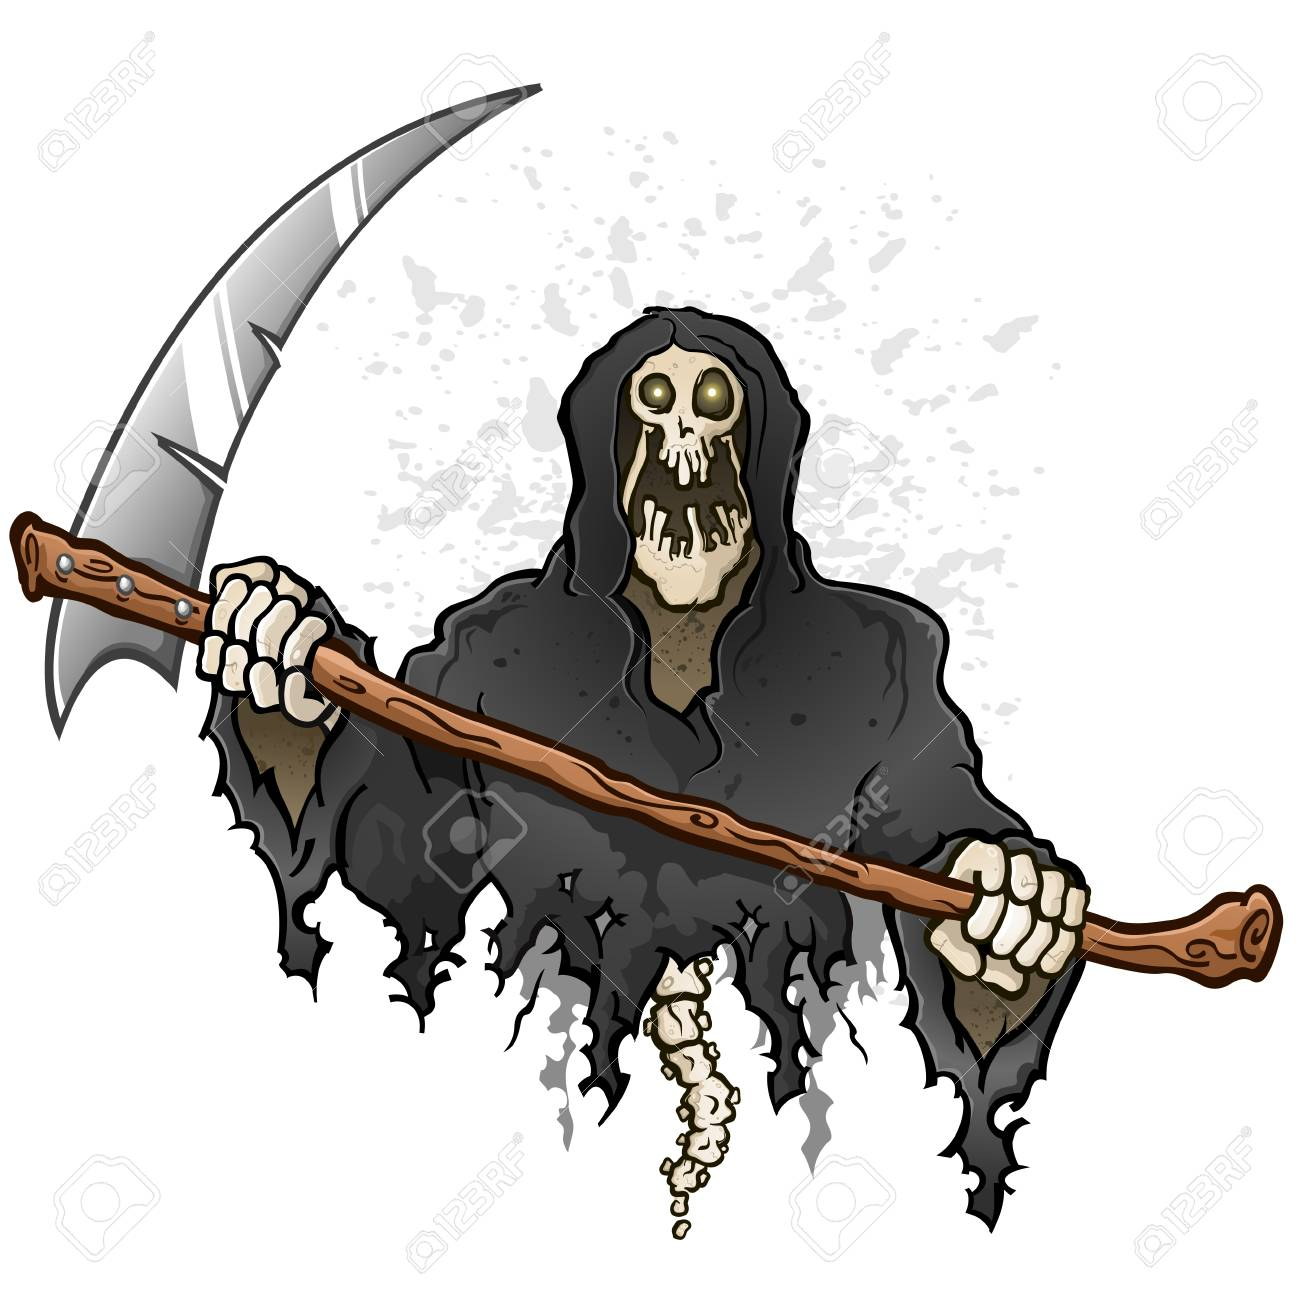 [Image: 117260553-grim-reaper-cartoon-character-...scythe.jpg]